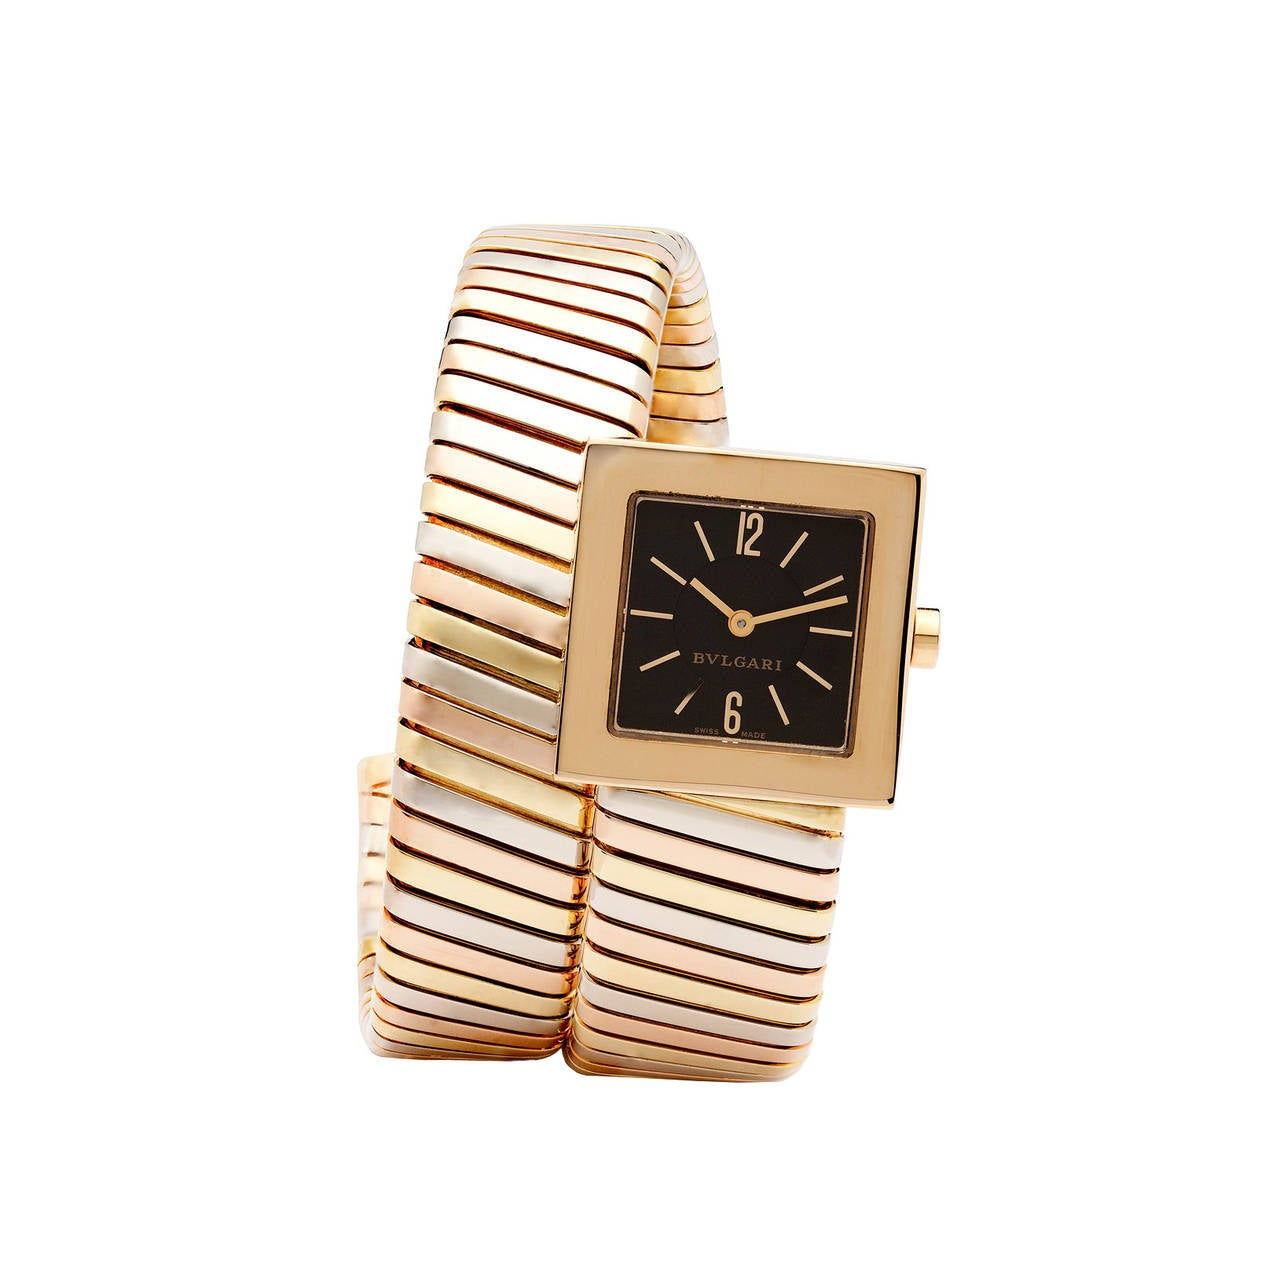 Bulgari Lady's Three Color Gold Quartz Serpenti Wristwatch